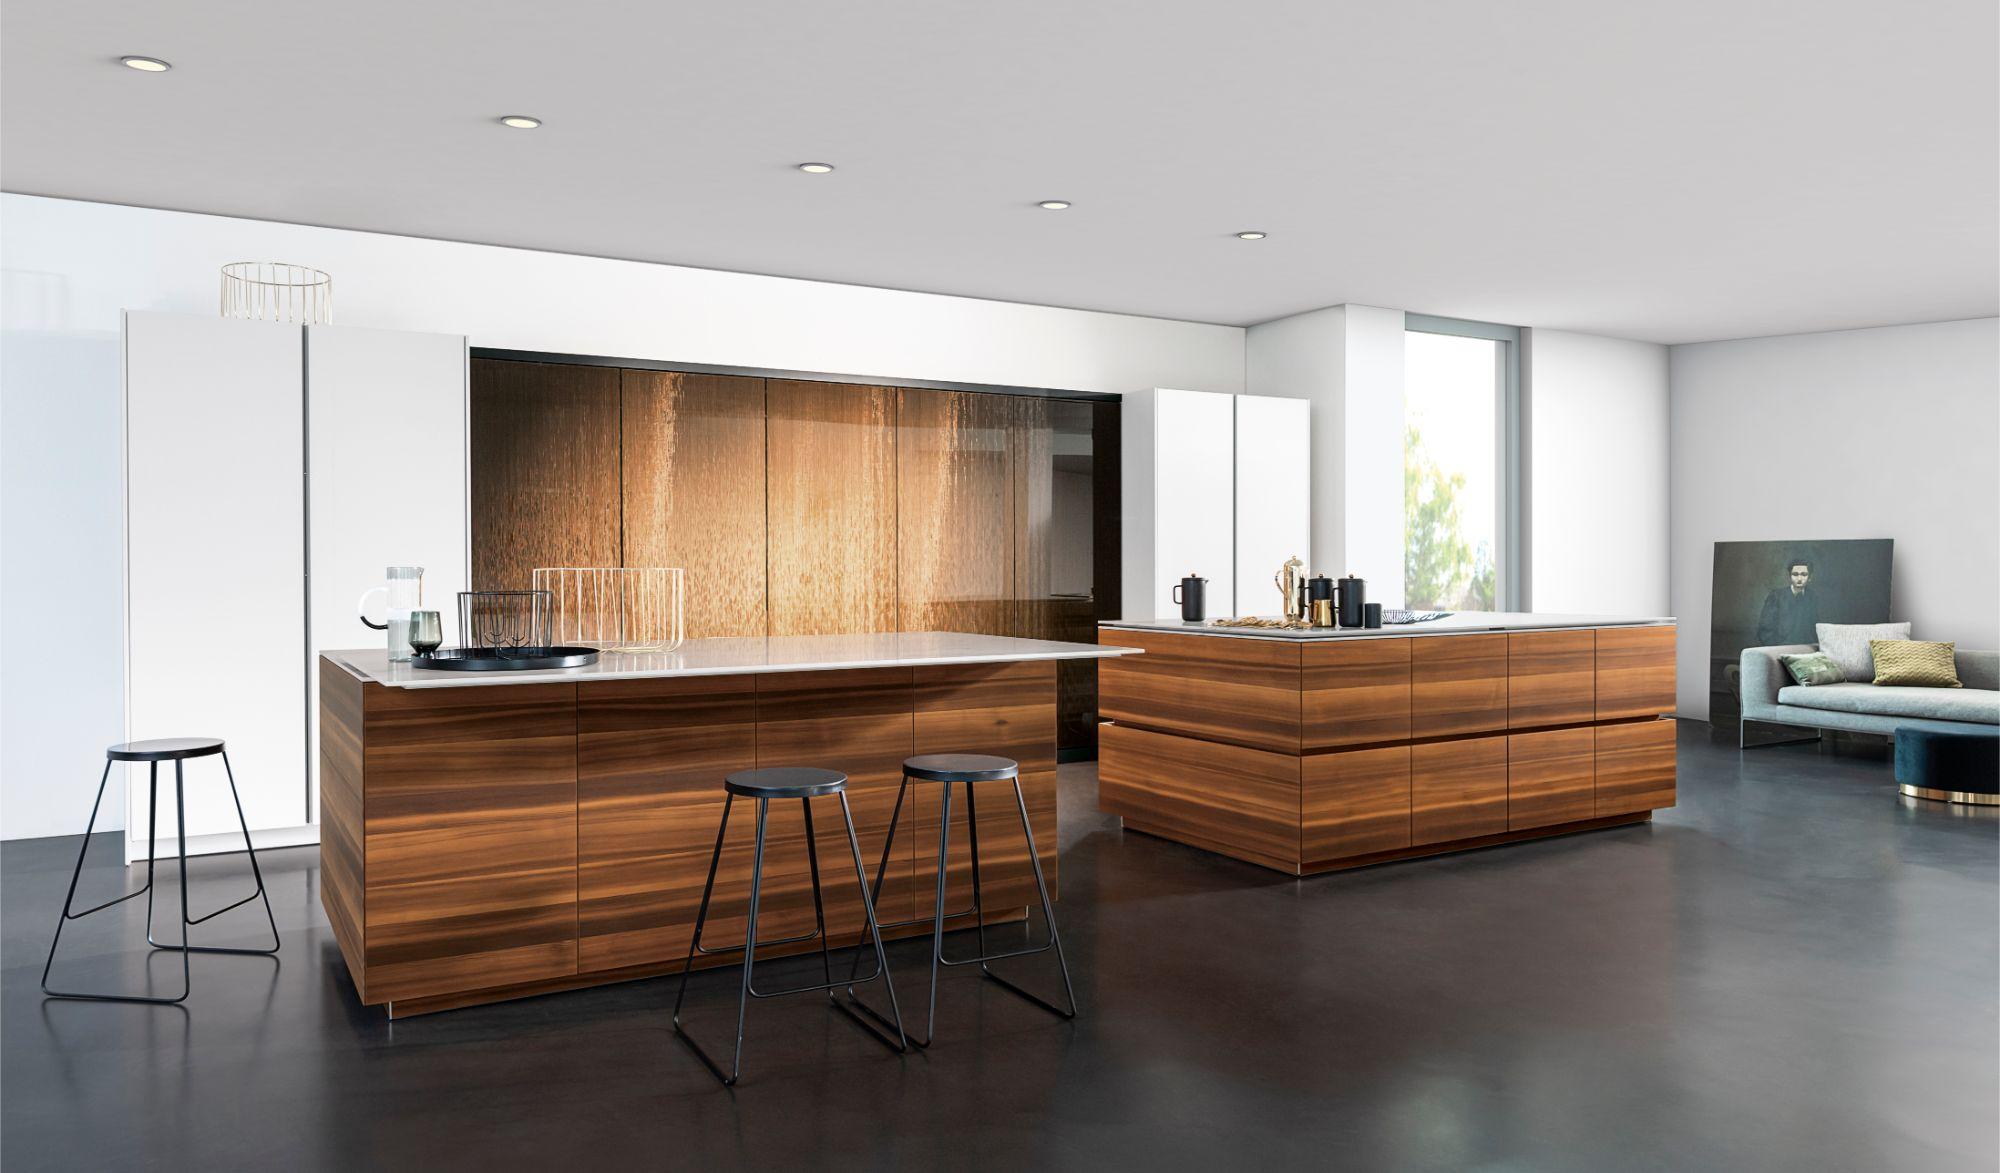 eggersmanns' exclusive Interlink glass finish in bronze applied to work's turnstile pantry doors